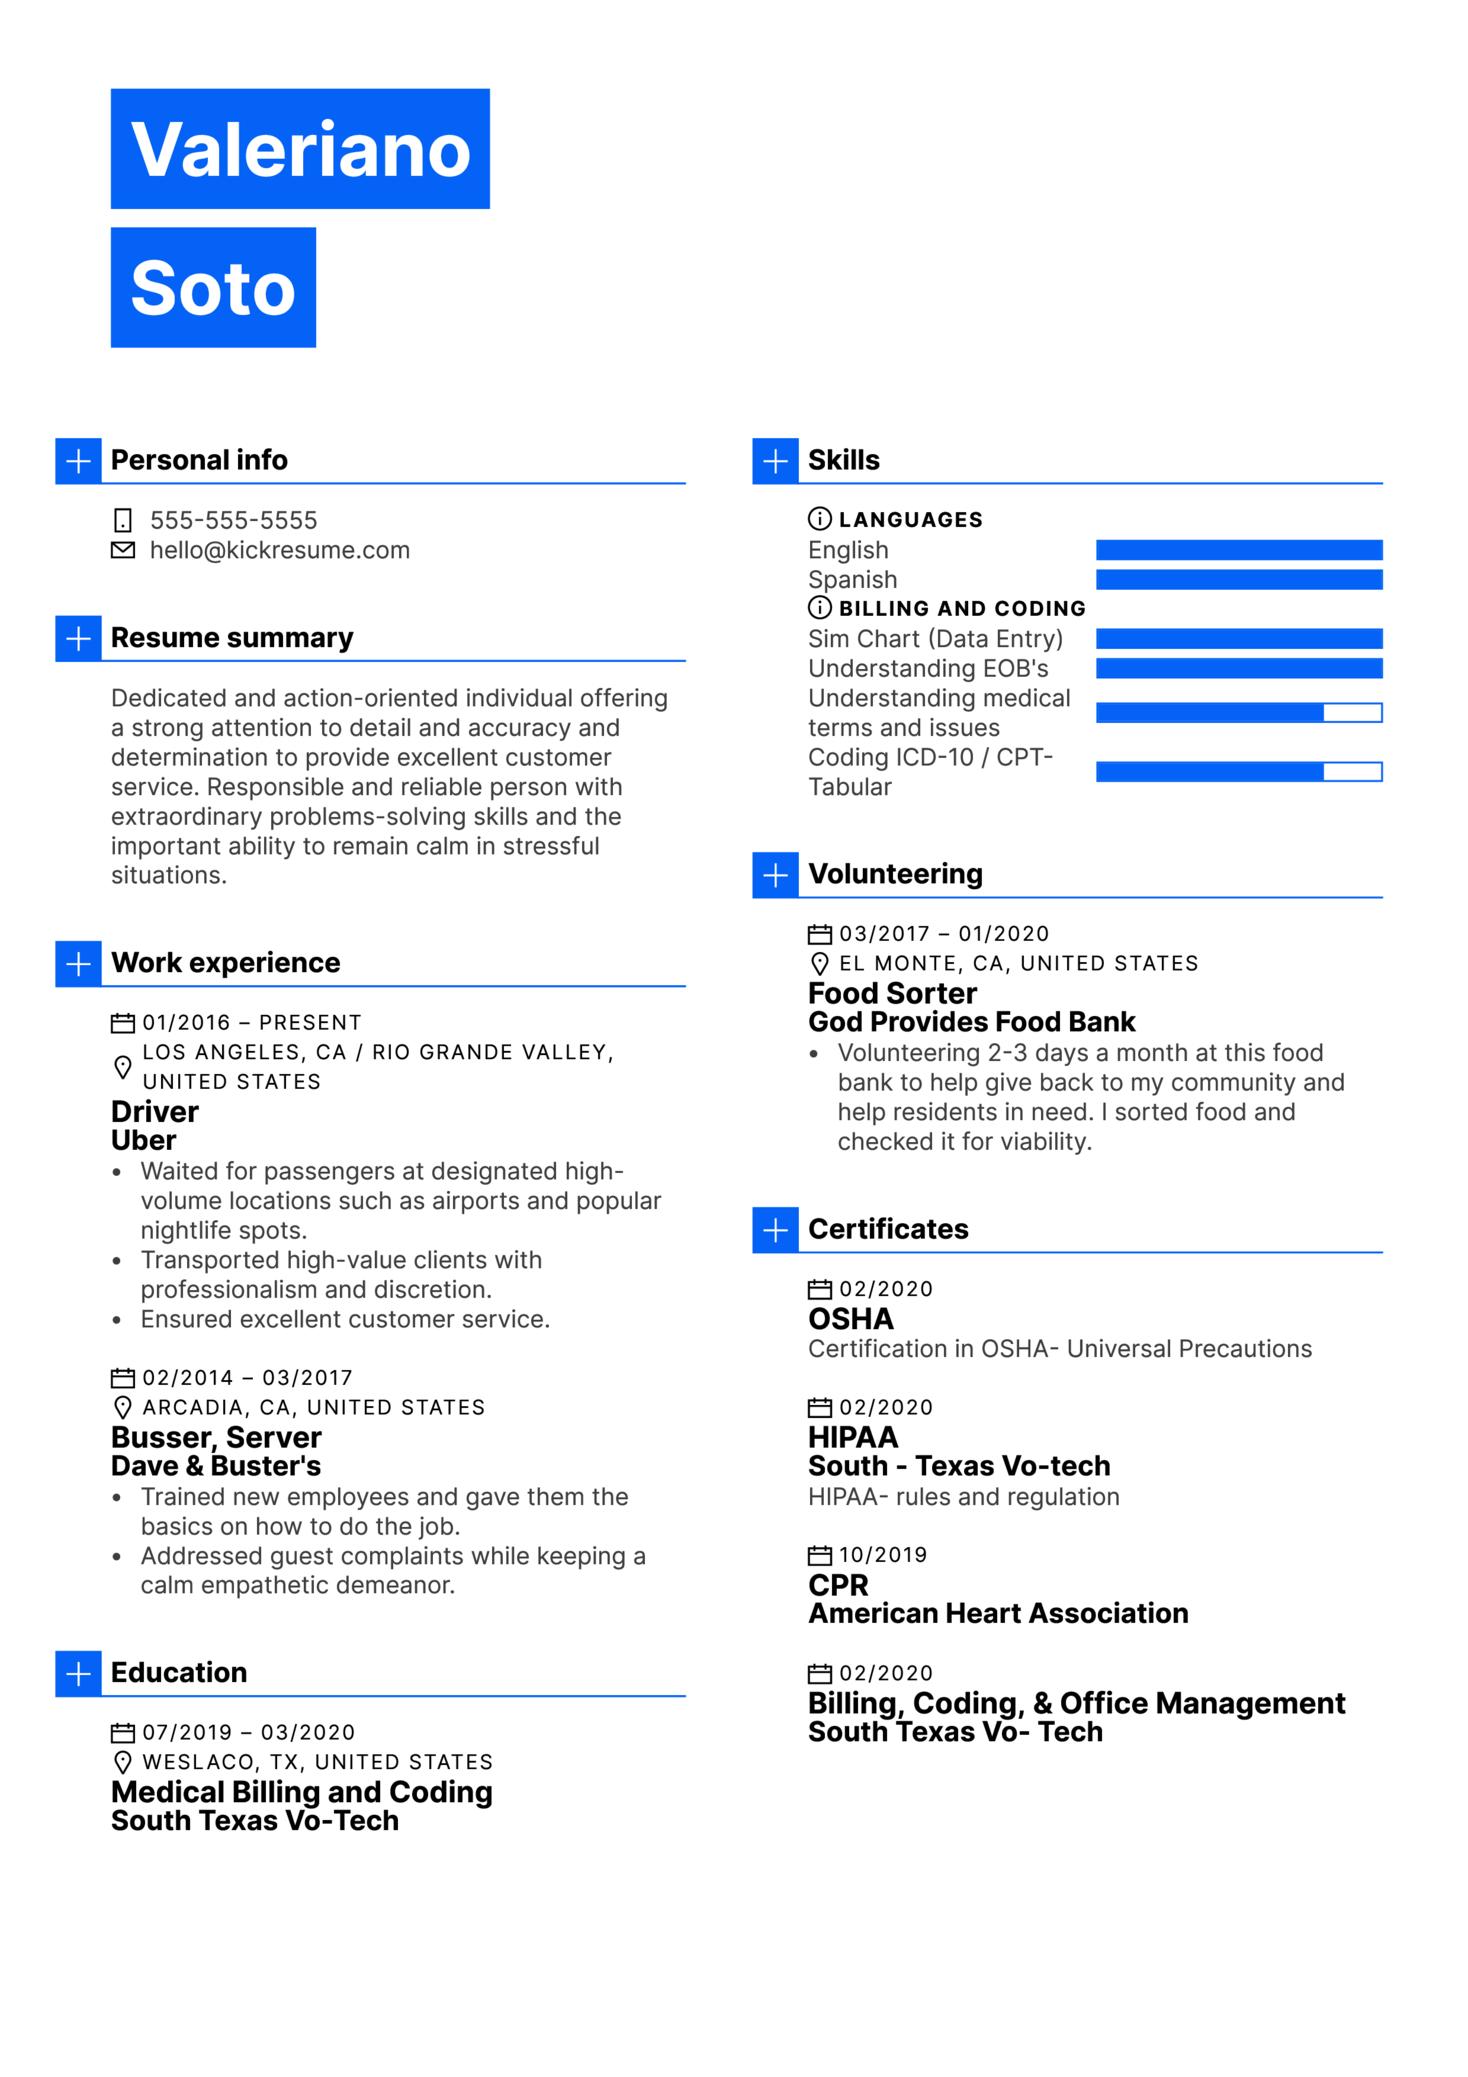 DoorDash Driver Resume Example (parte 1)